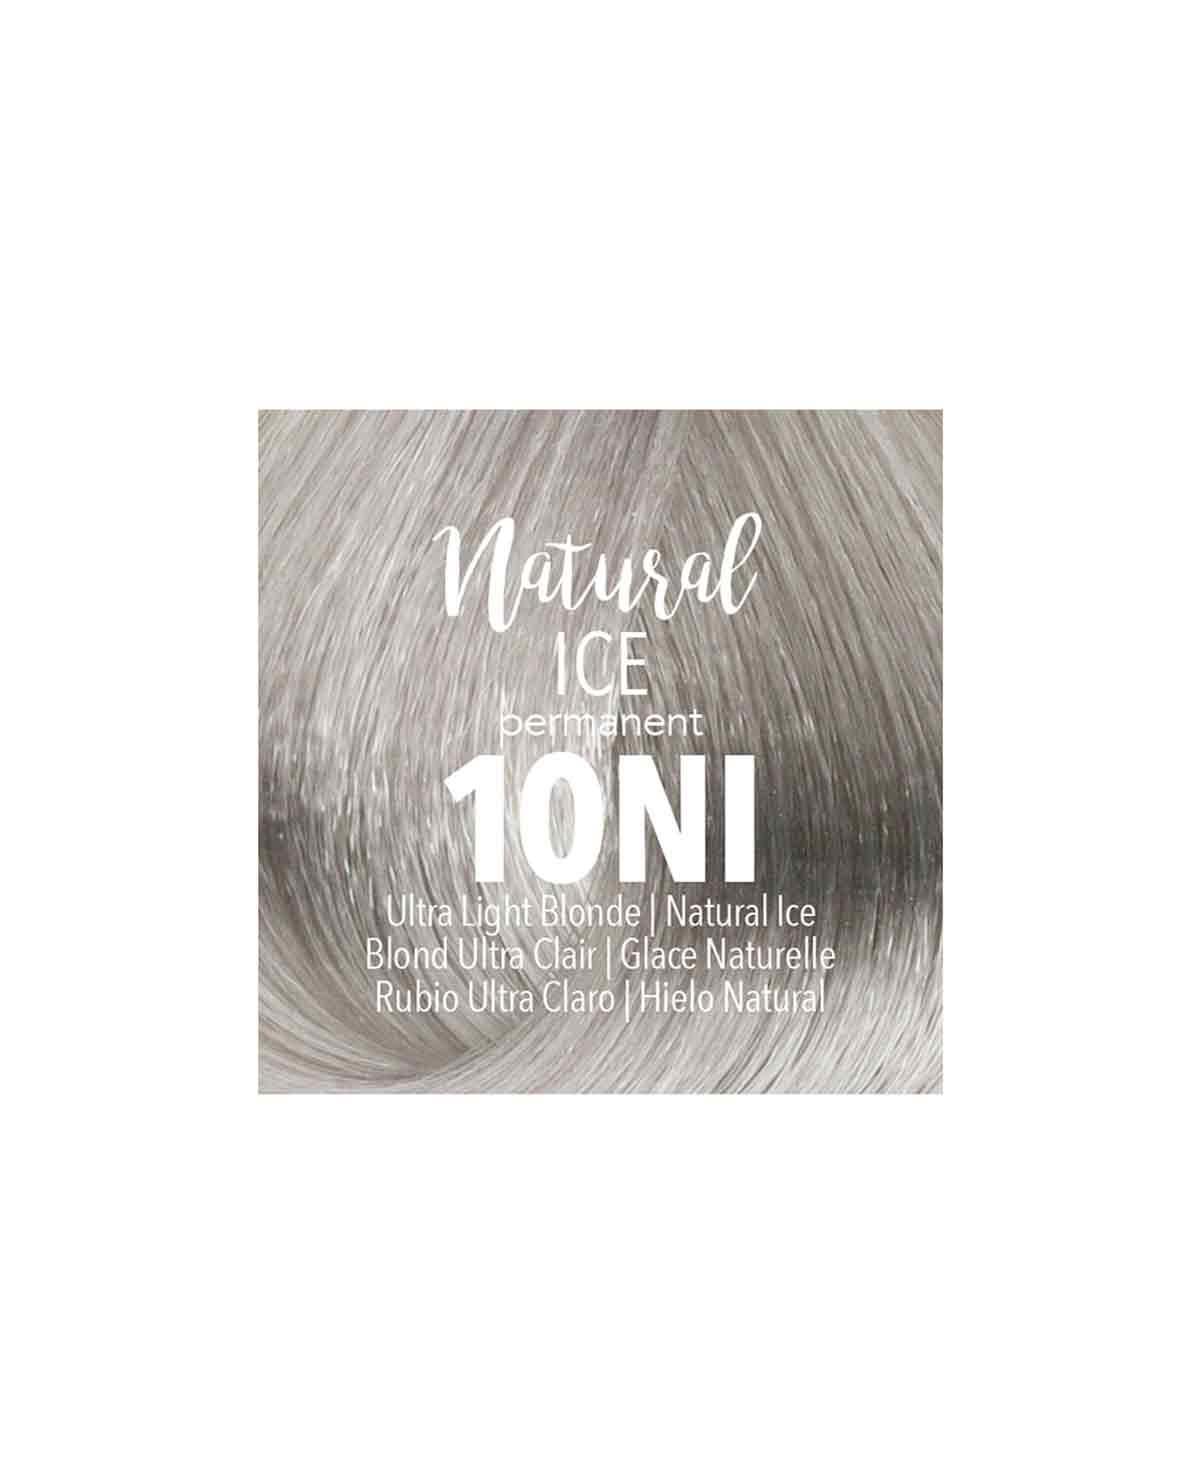 Mydentity - 10NI Ultra Light Blonde Natural Ice